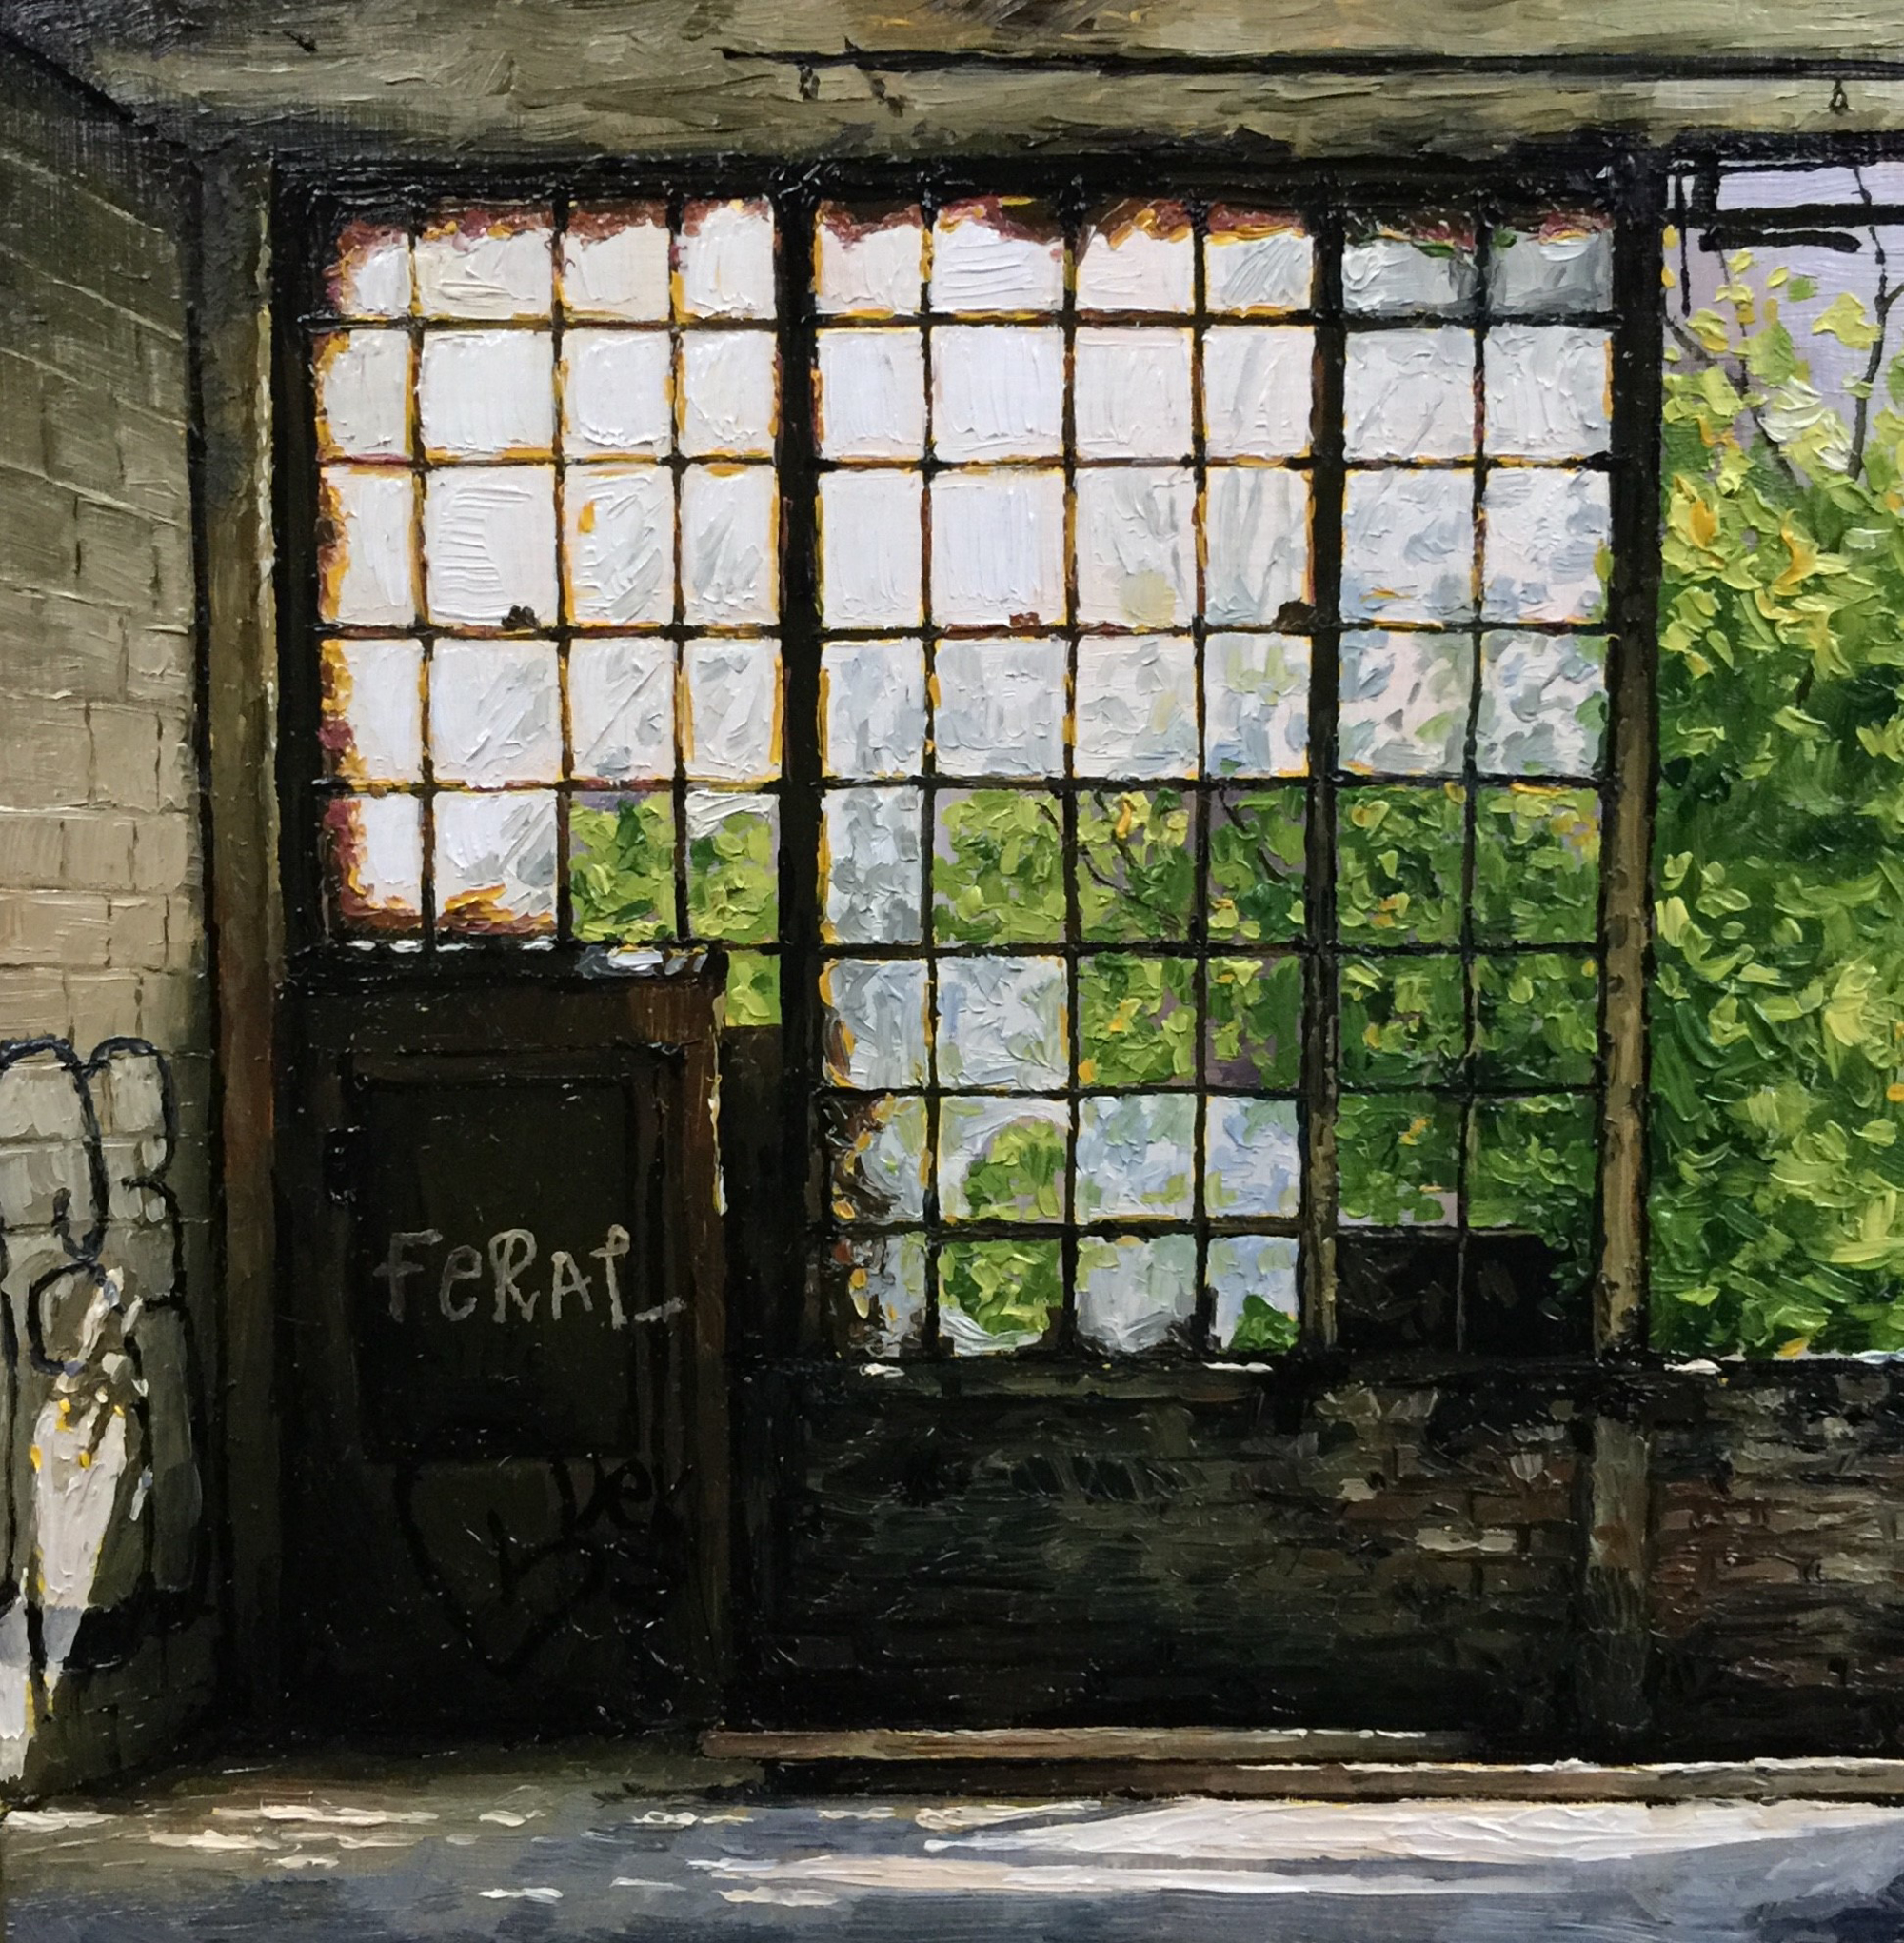 Feral by Stephanie Buer